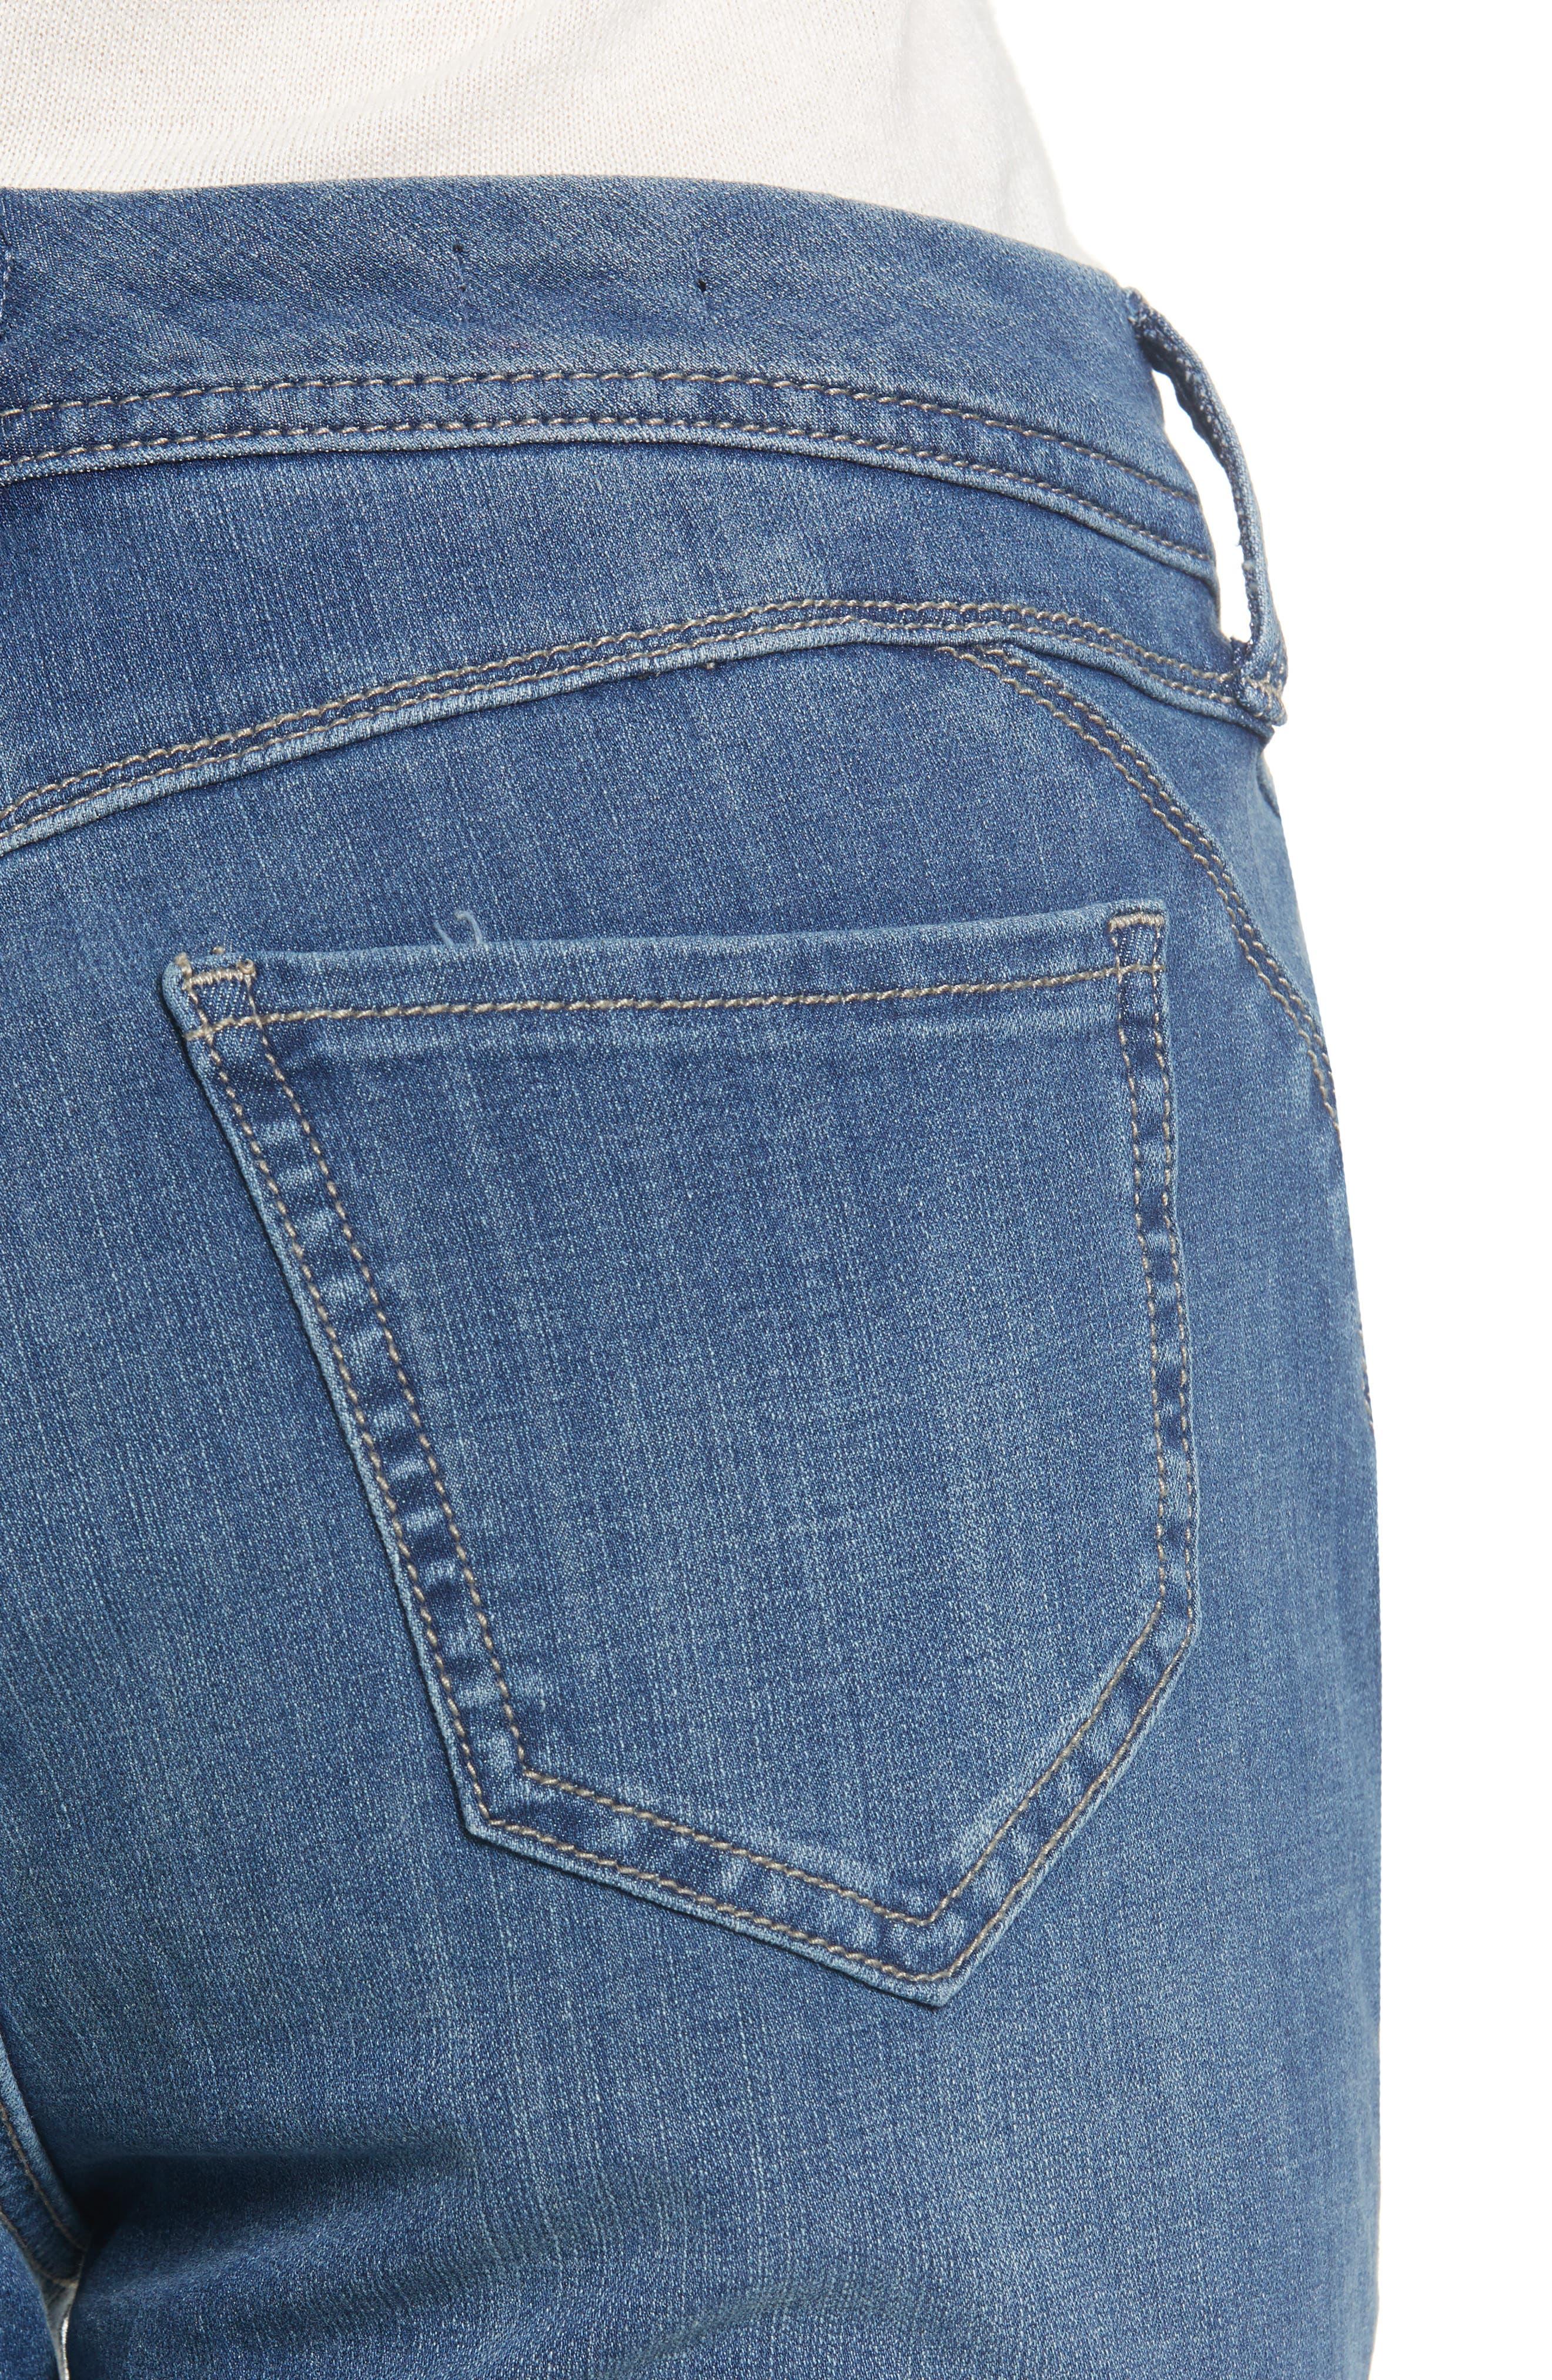 Release Hem Skinny Jeans,                             Alternate thumbnail 4, color,                             LEAR